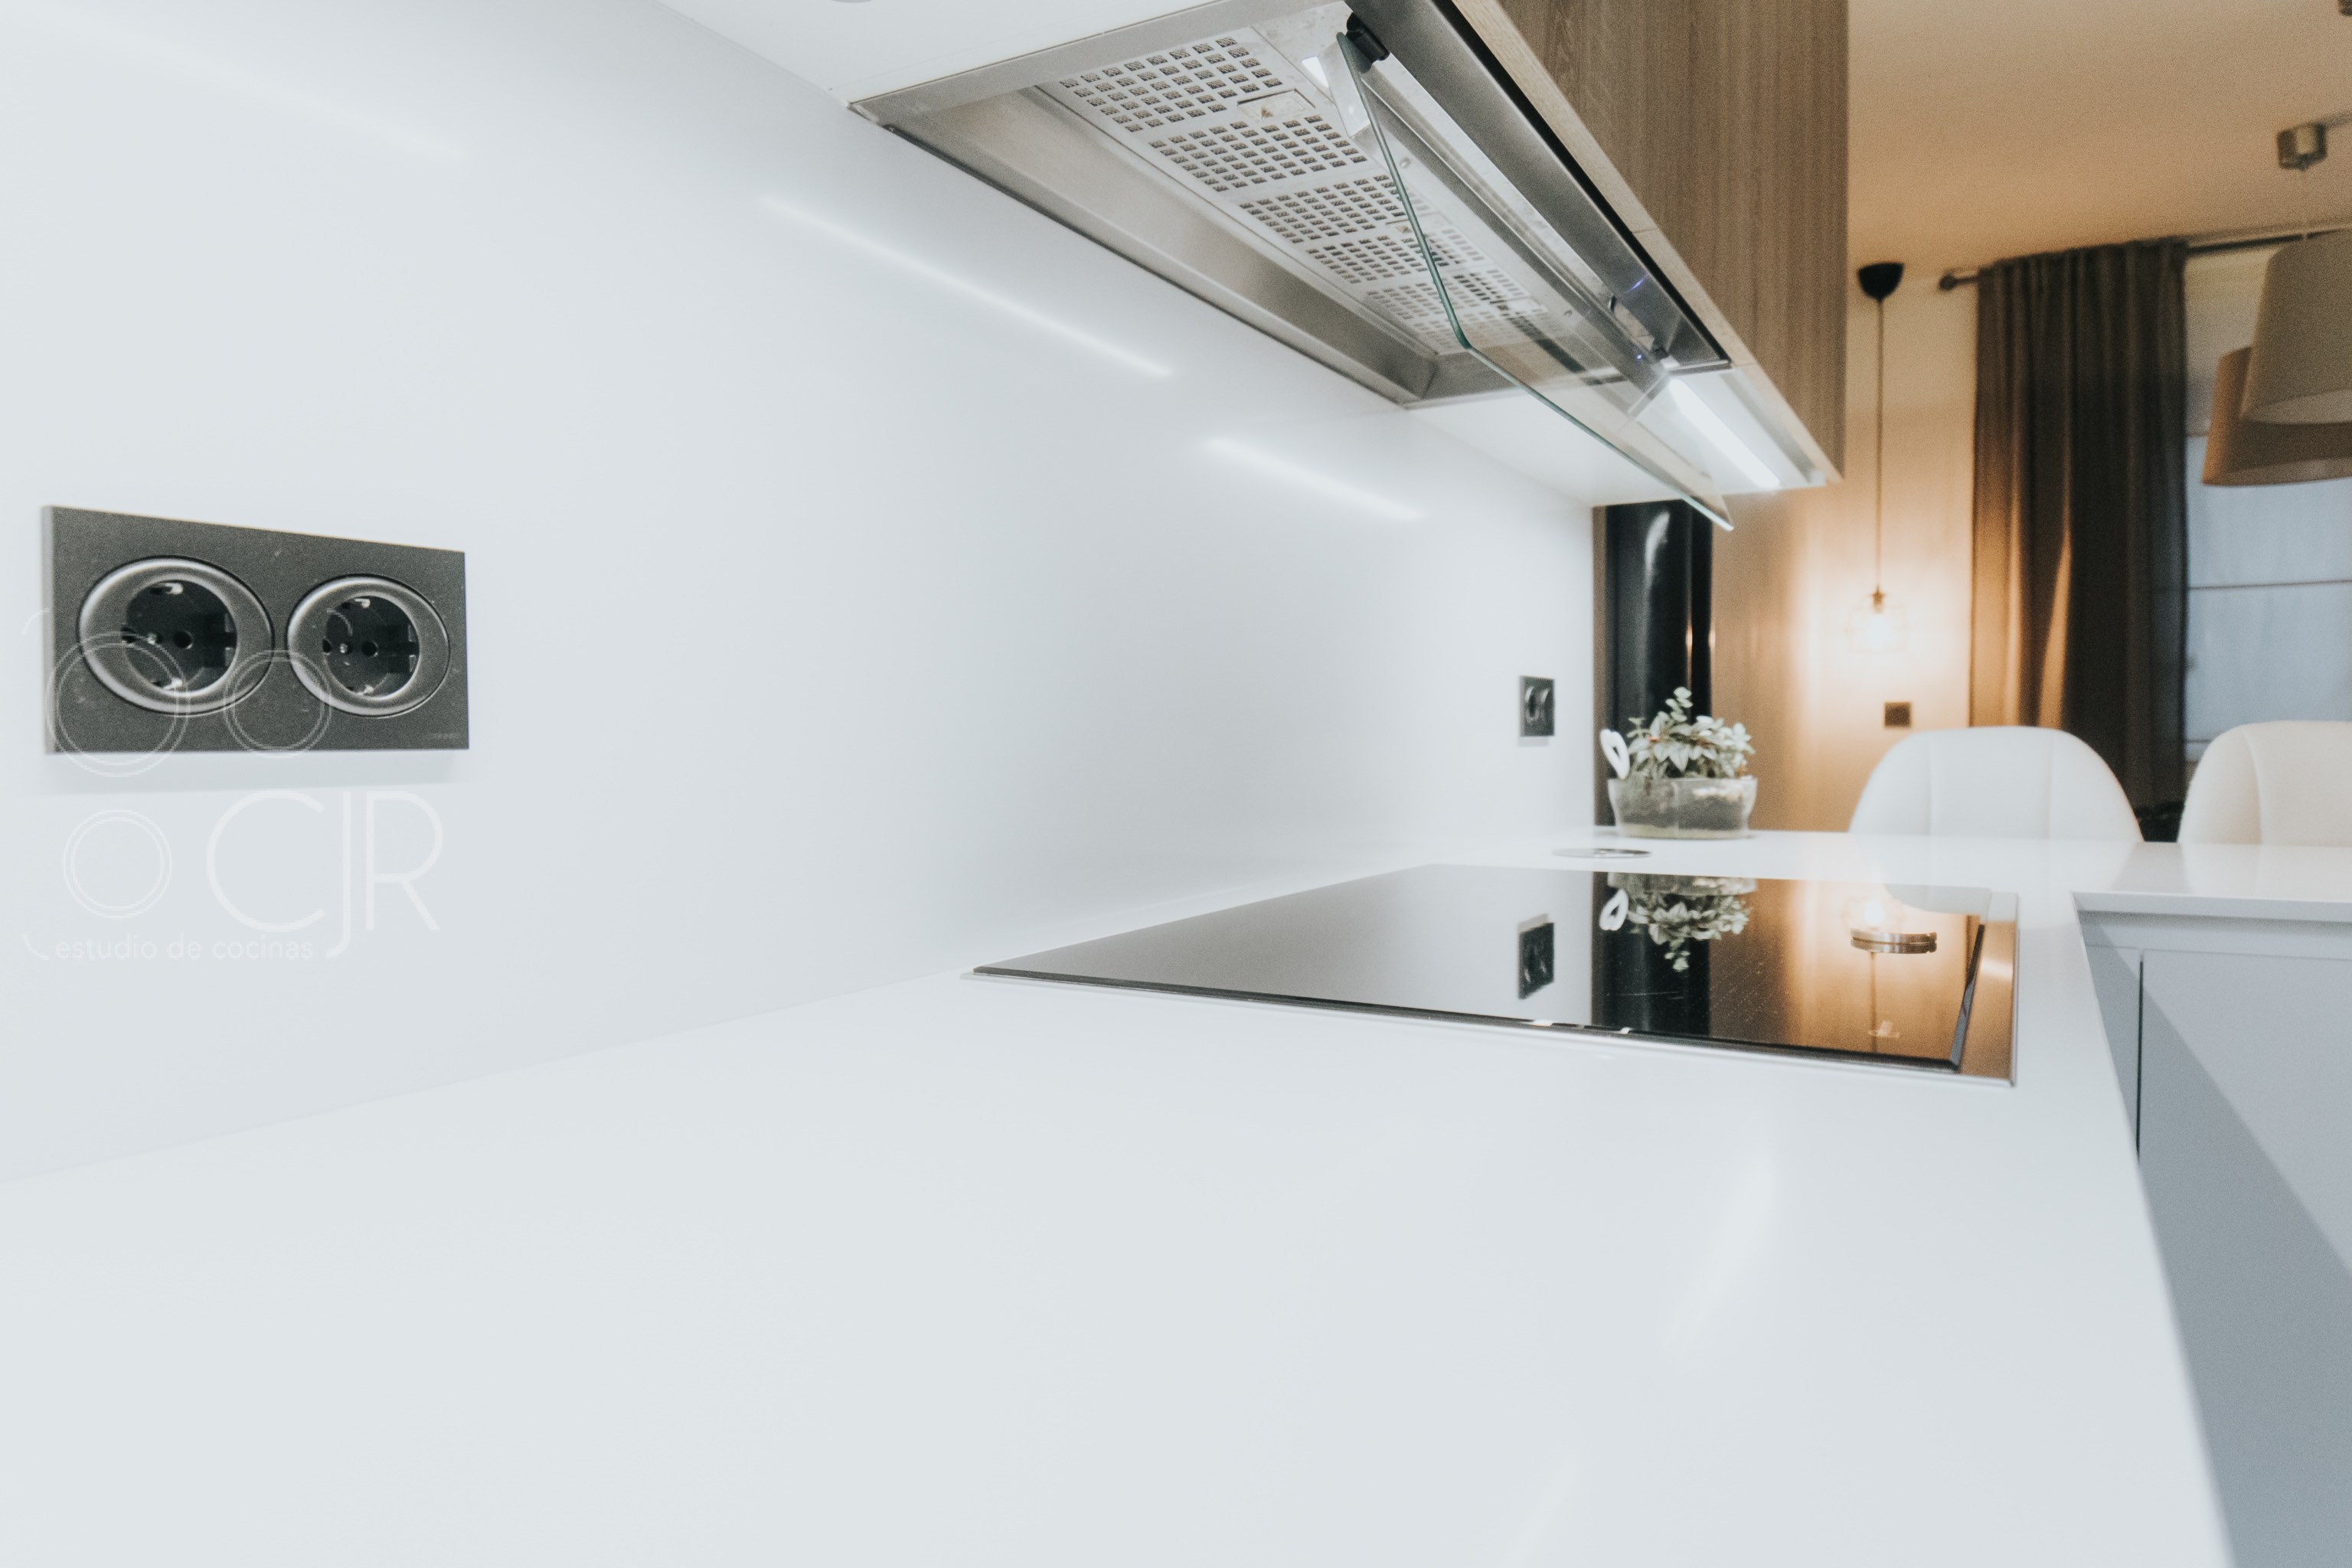 campana integrada cocinas modernas